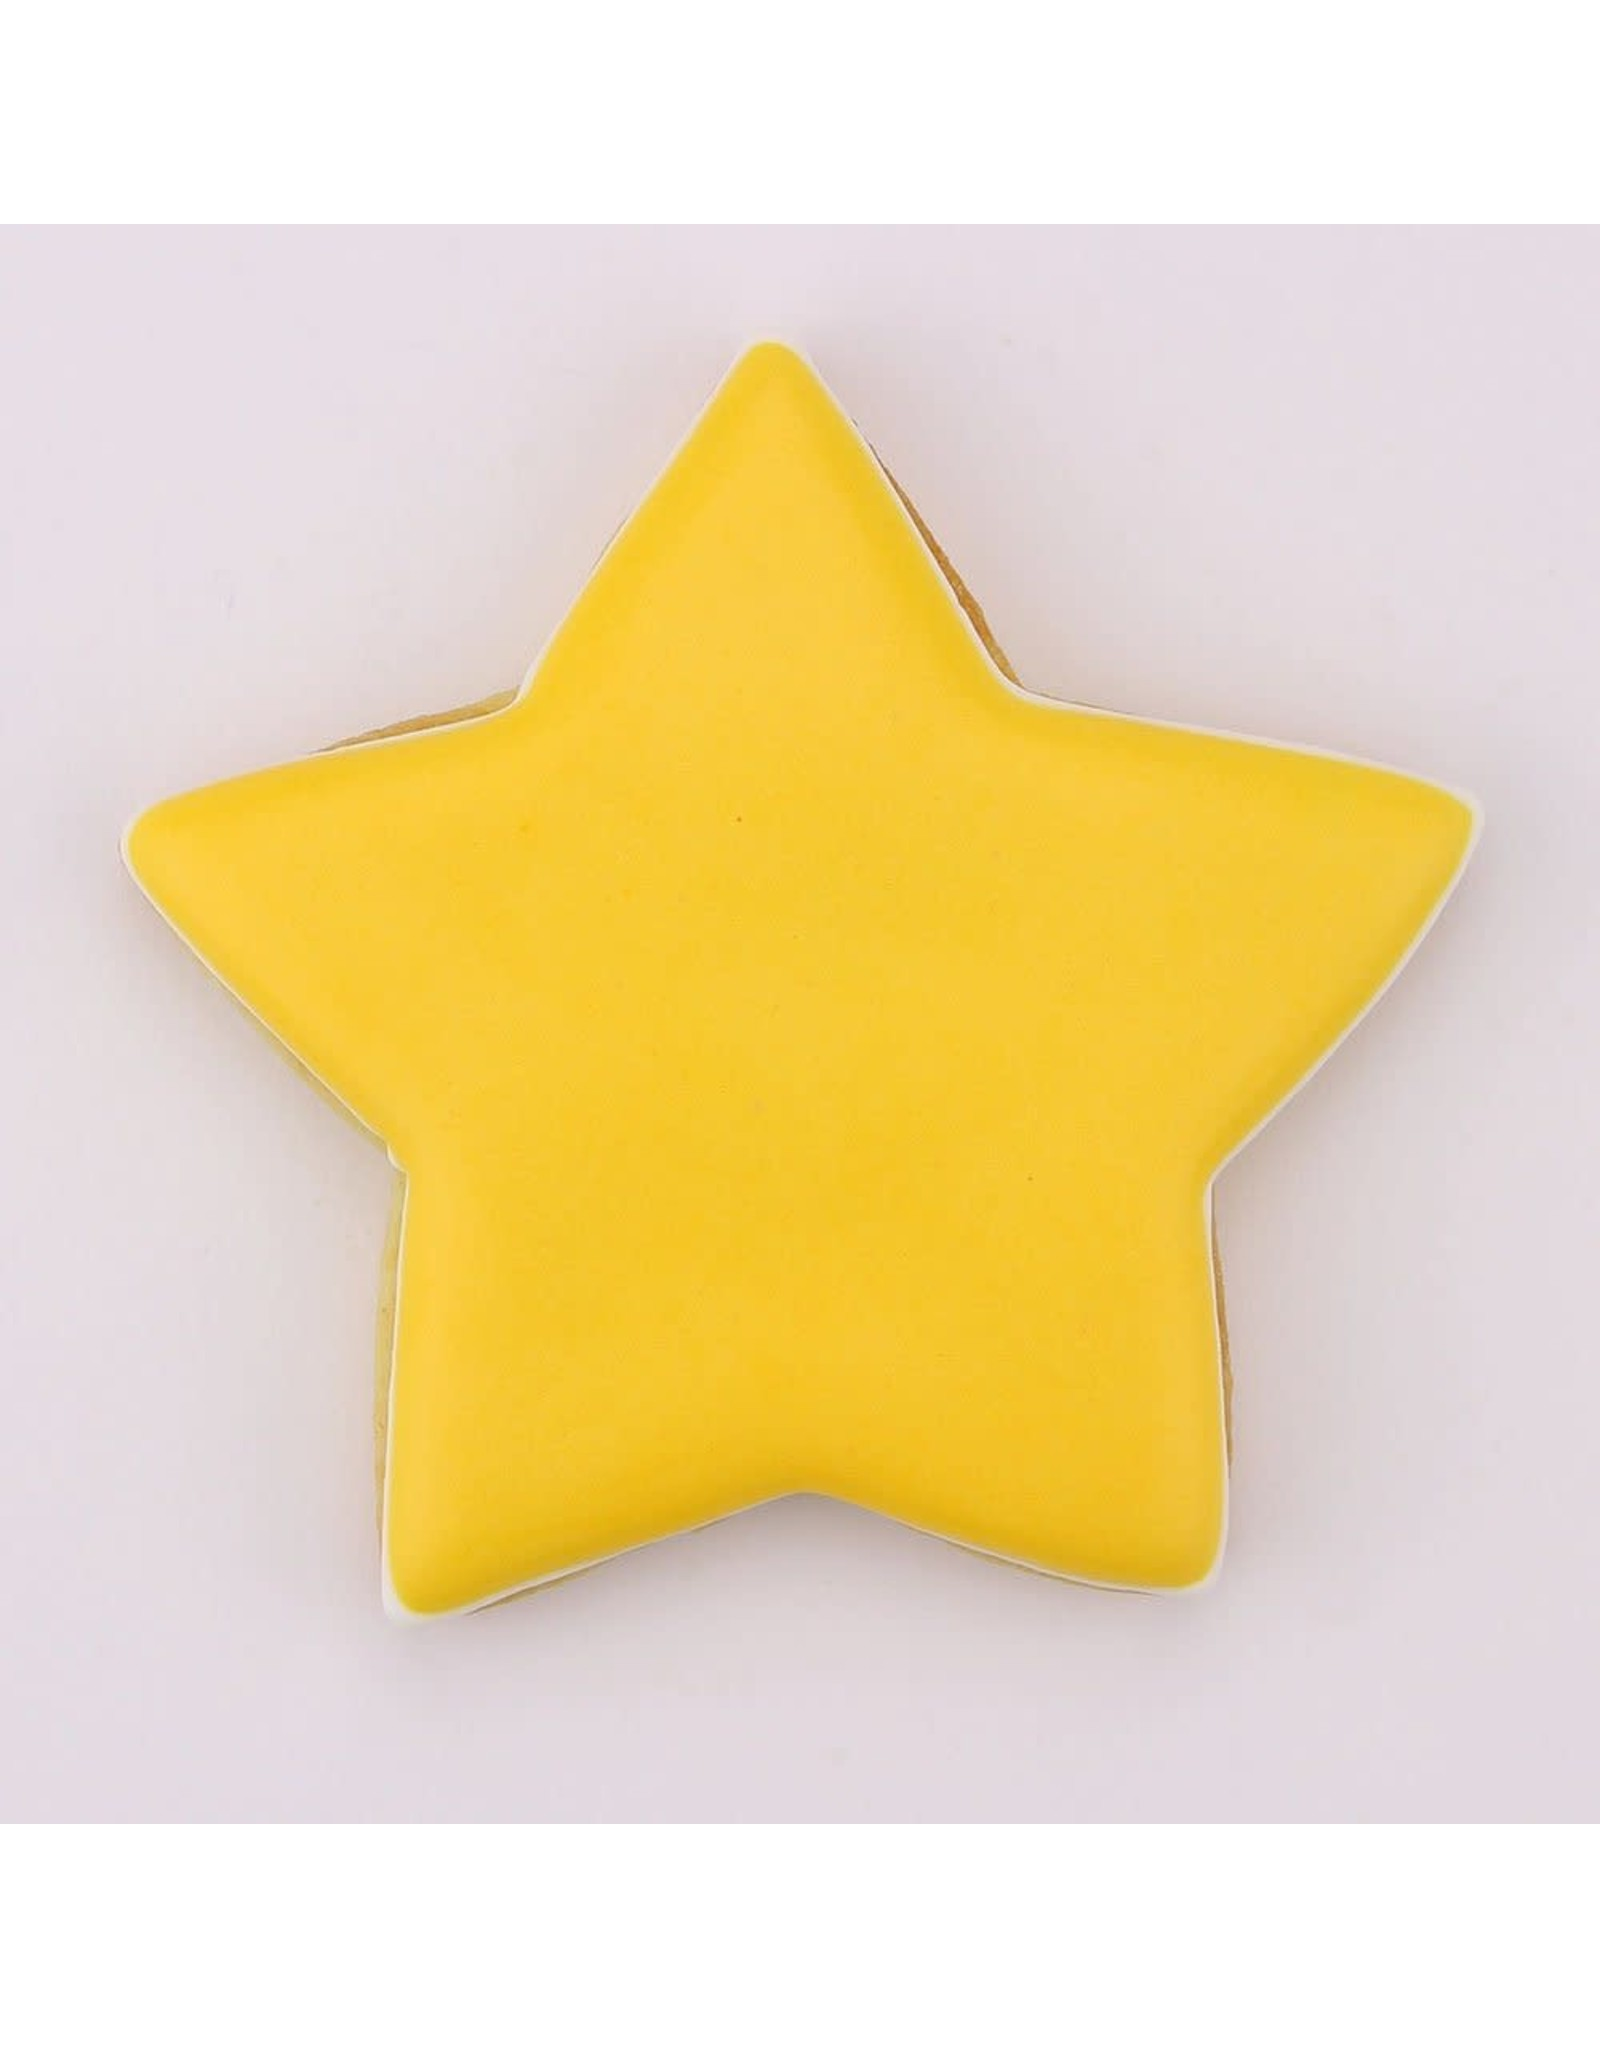 "Ann Clark 3.5"" Star Cookie Cutter"